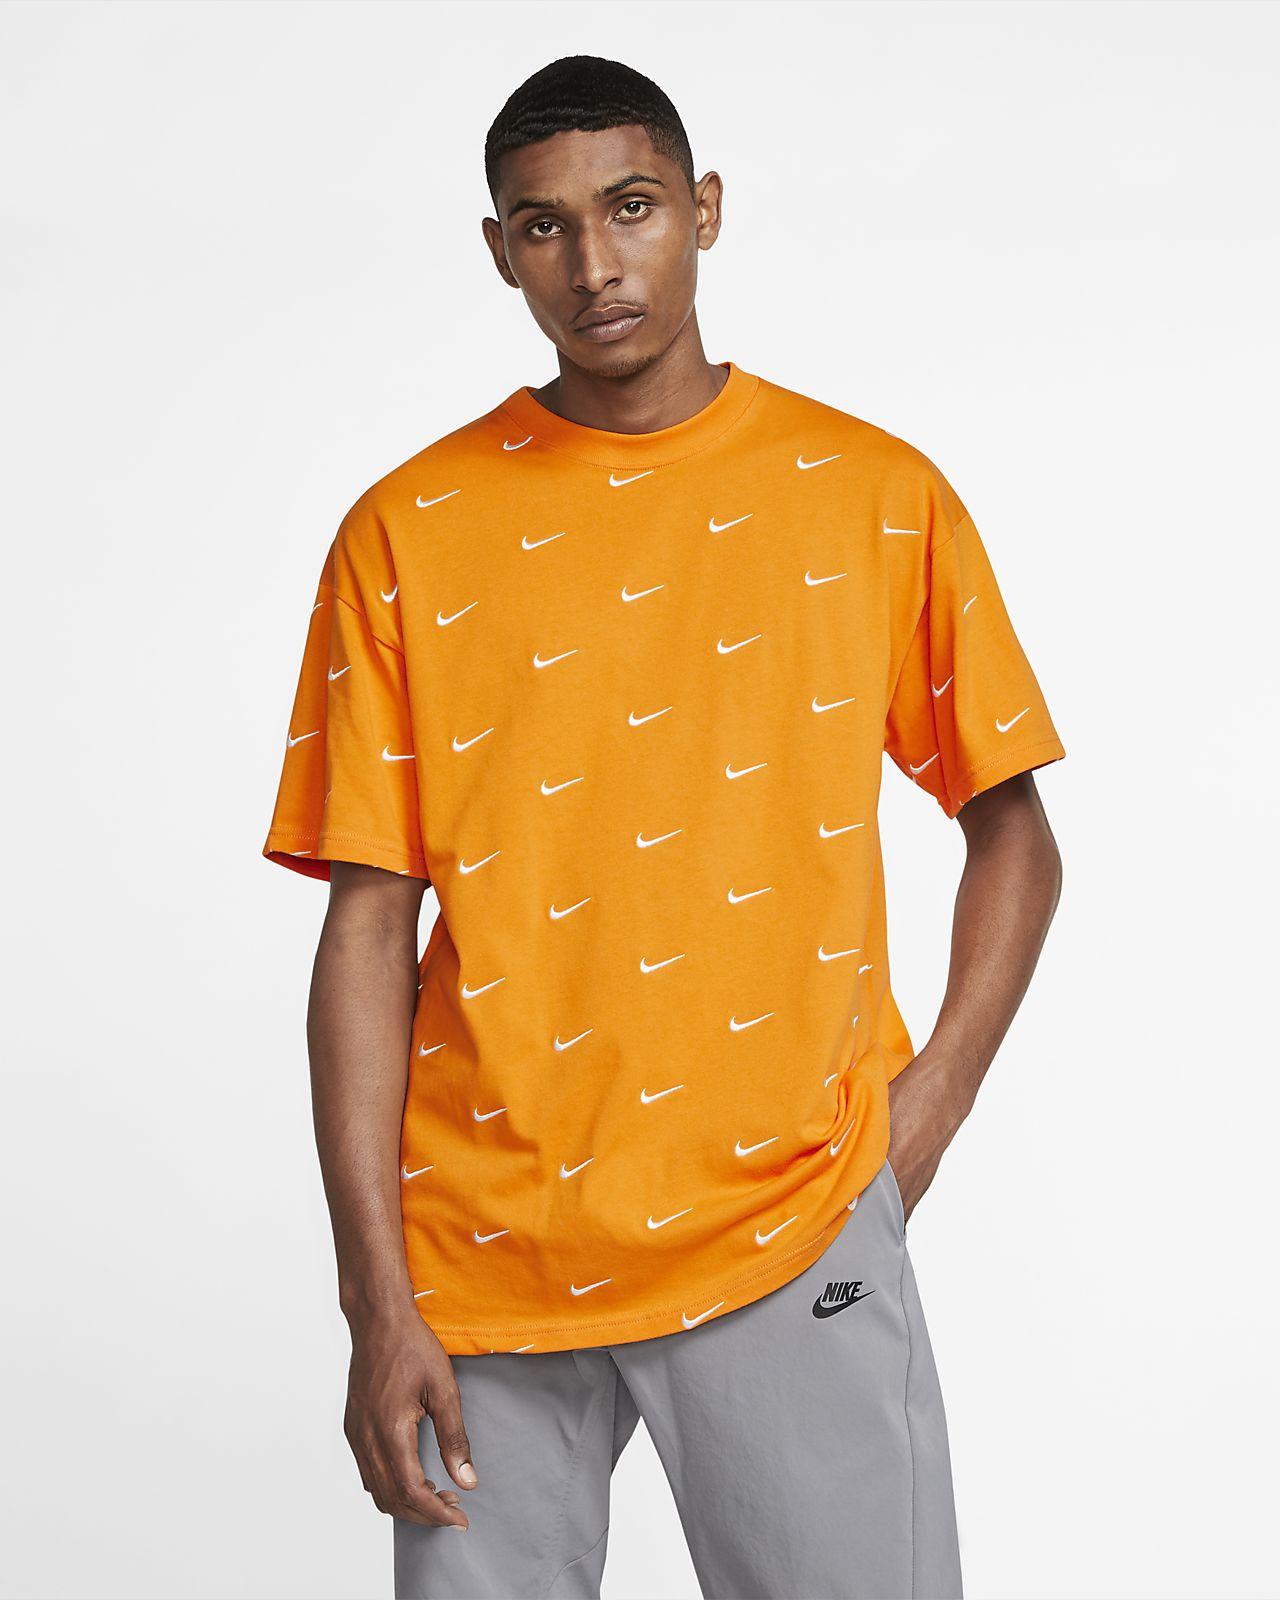 Nike Herren-T-Shirt mit Swoosh